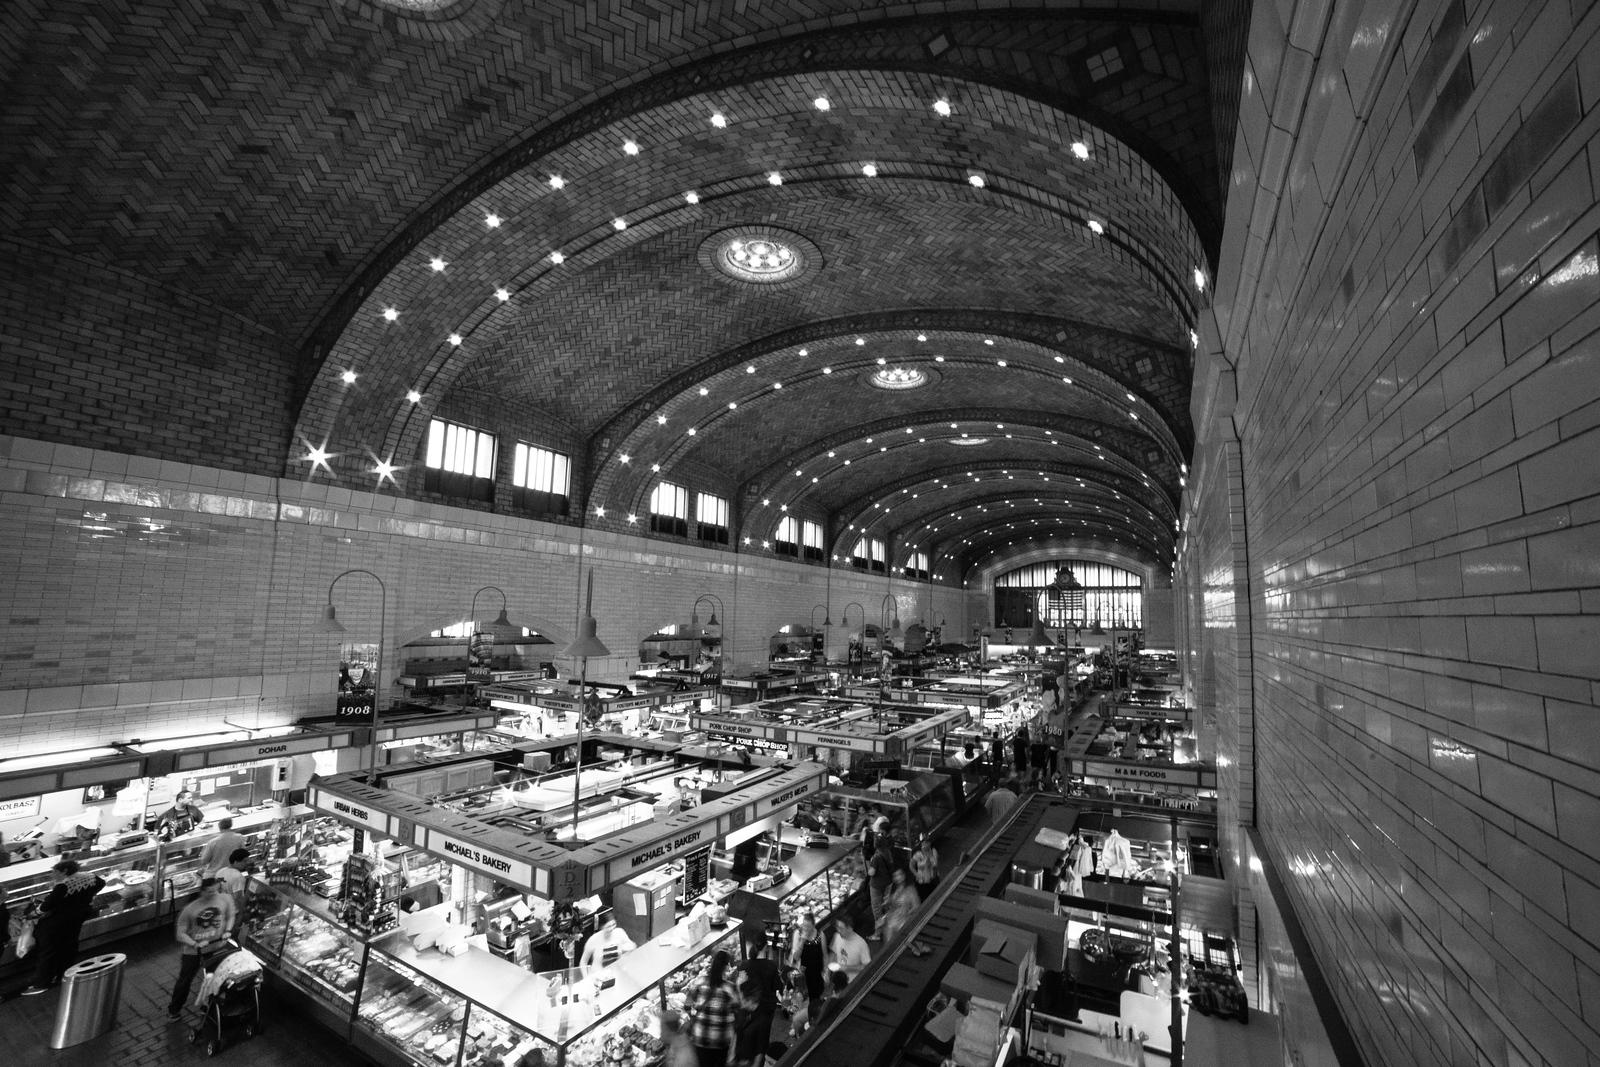 The West Side Market, September 2015 - Study 02.